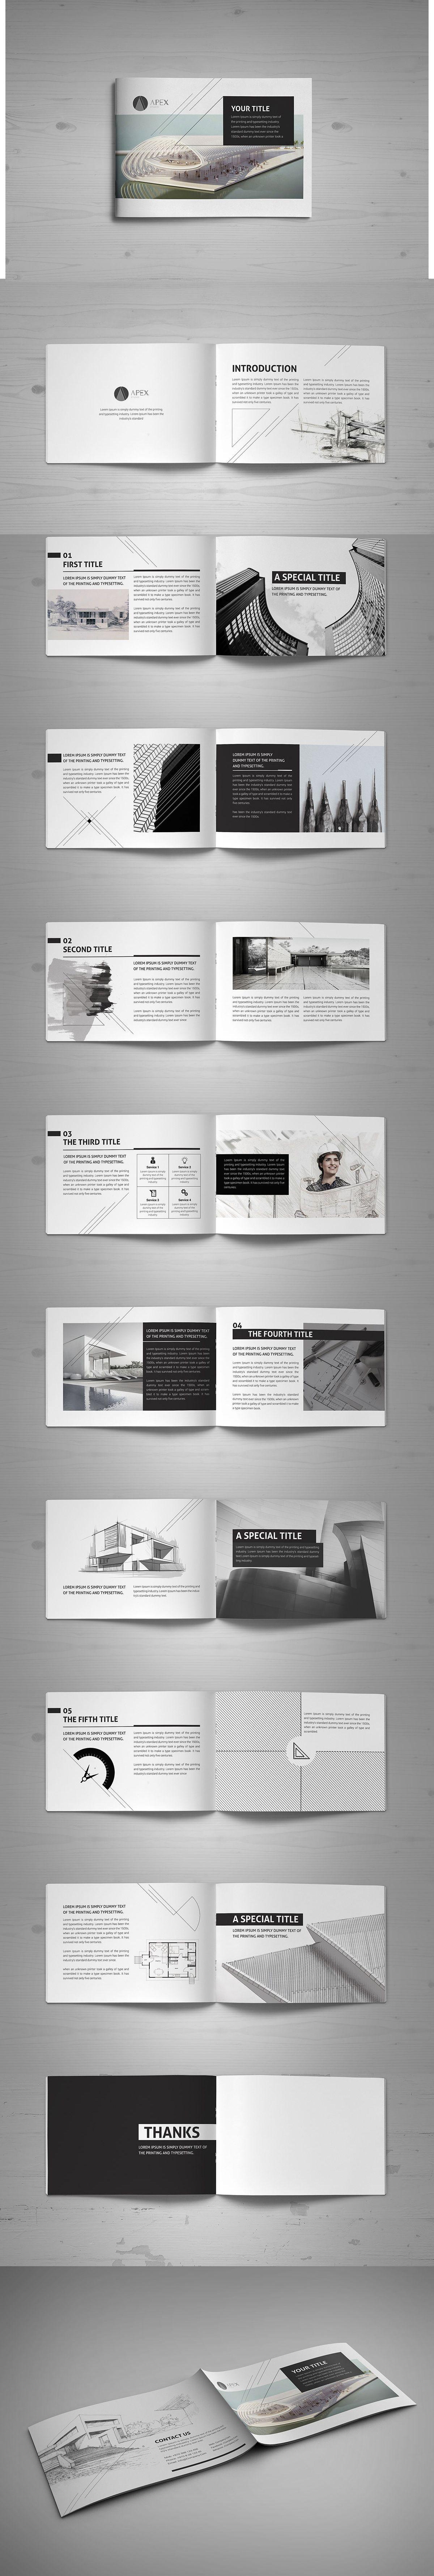 minimal modern black white architecture brochure template indesign indd brochure templates. Black Bedroom Furniture Sets. Home Design Ideas